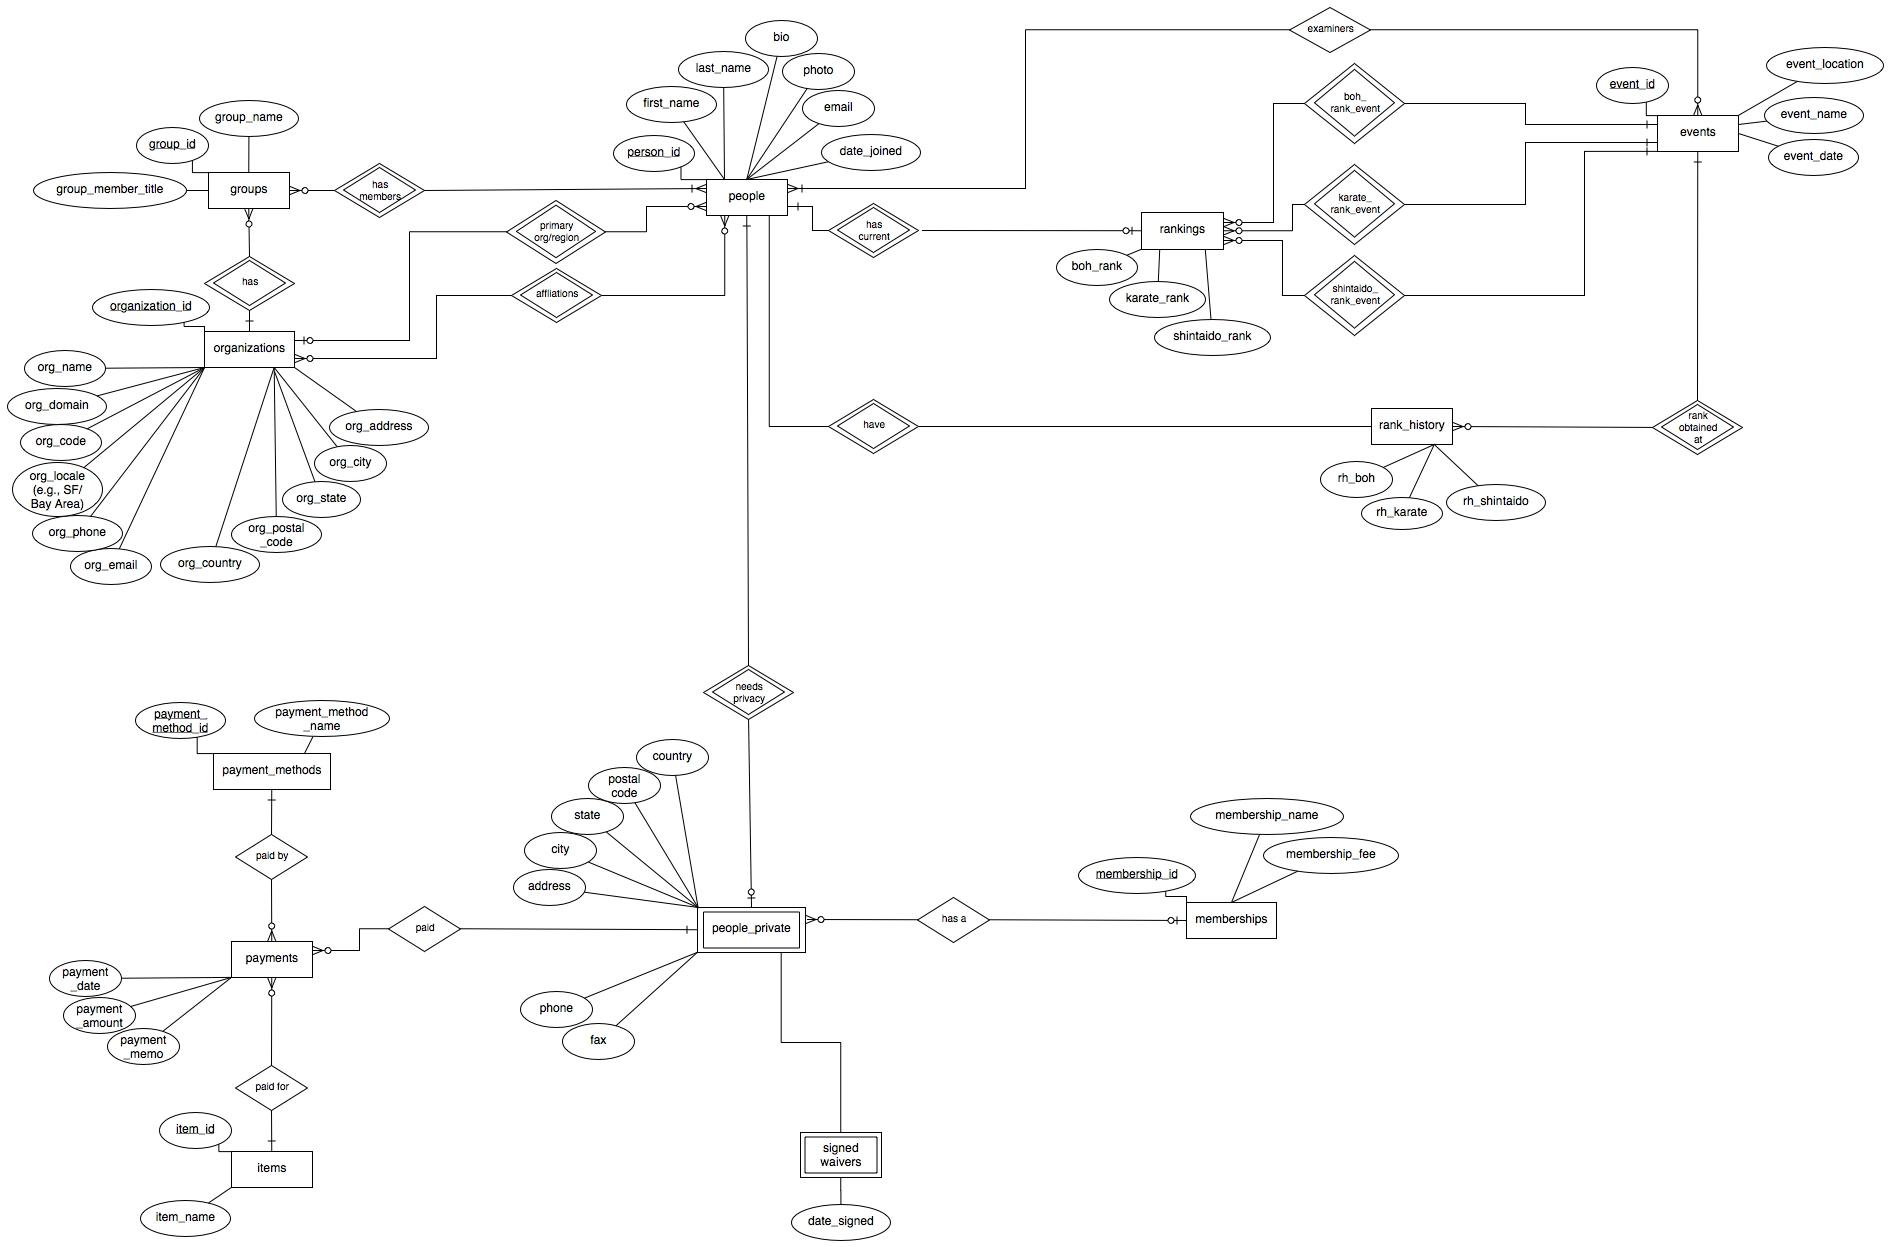 Building The Database: Database Design